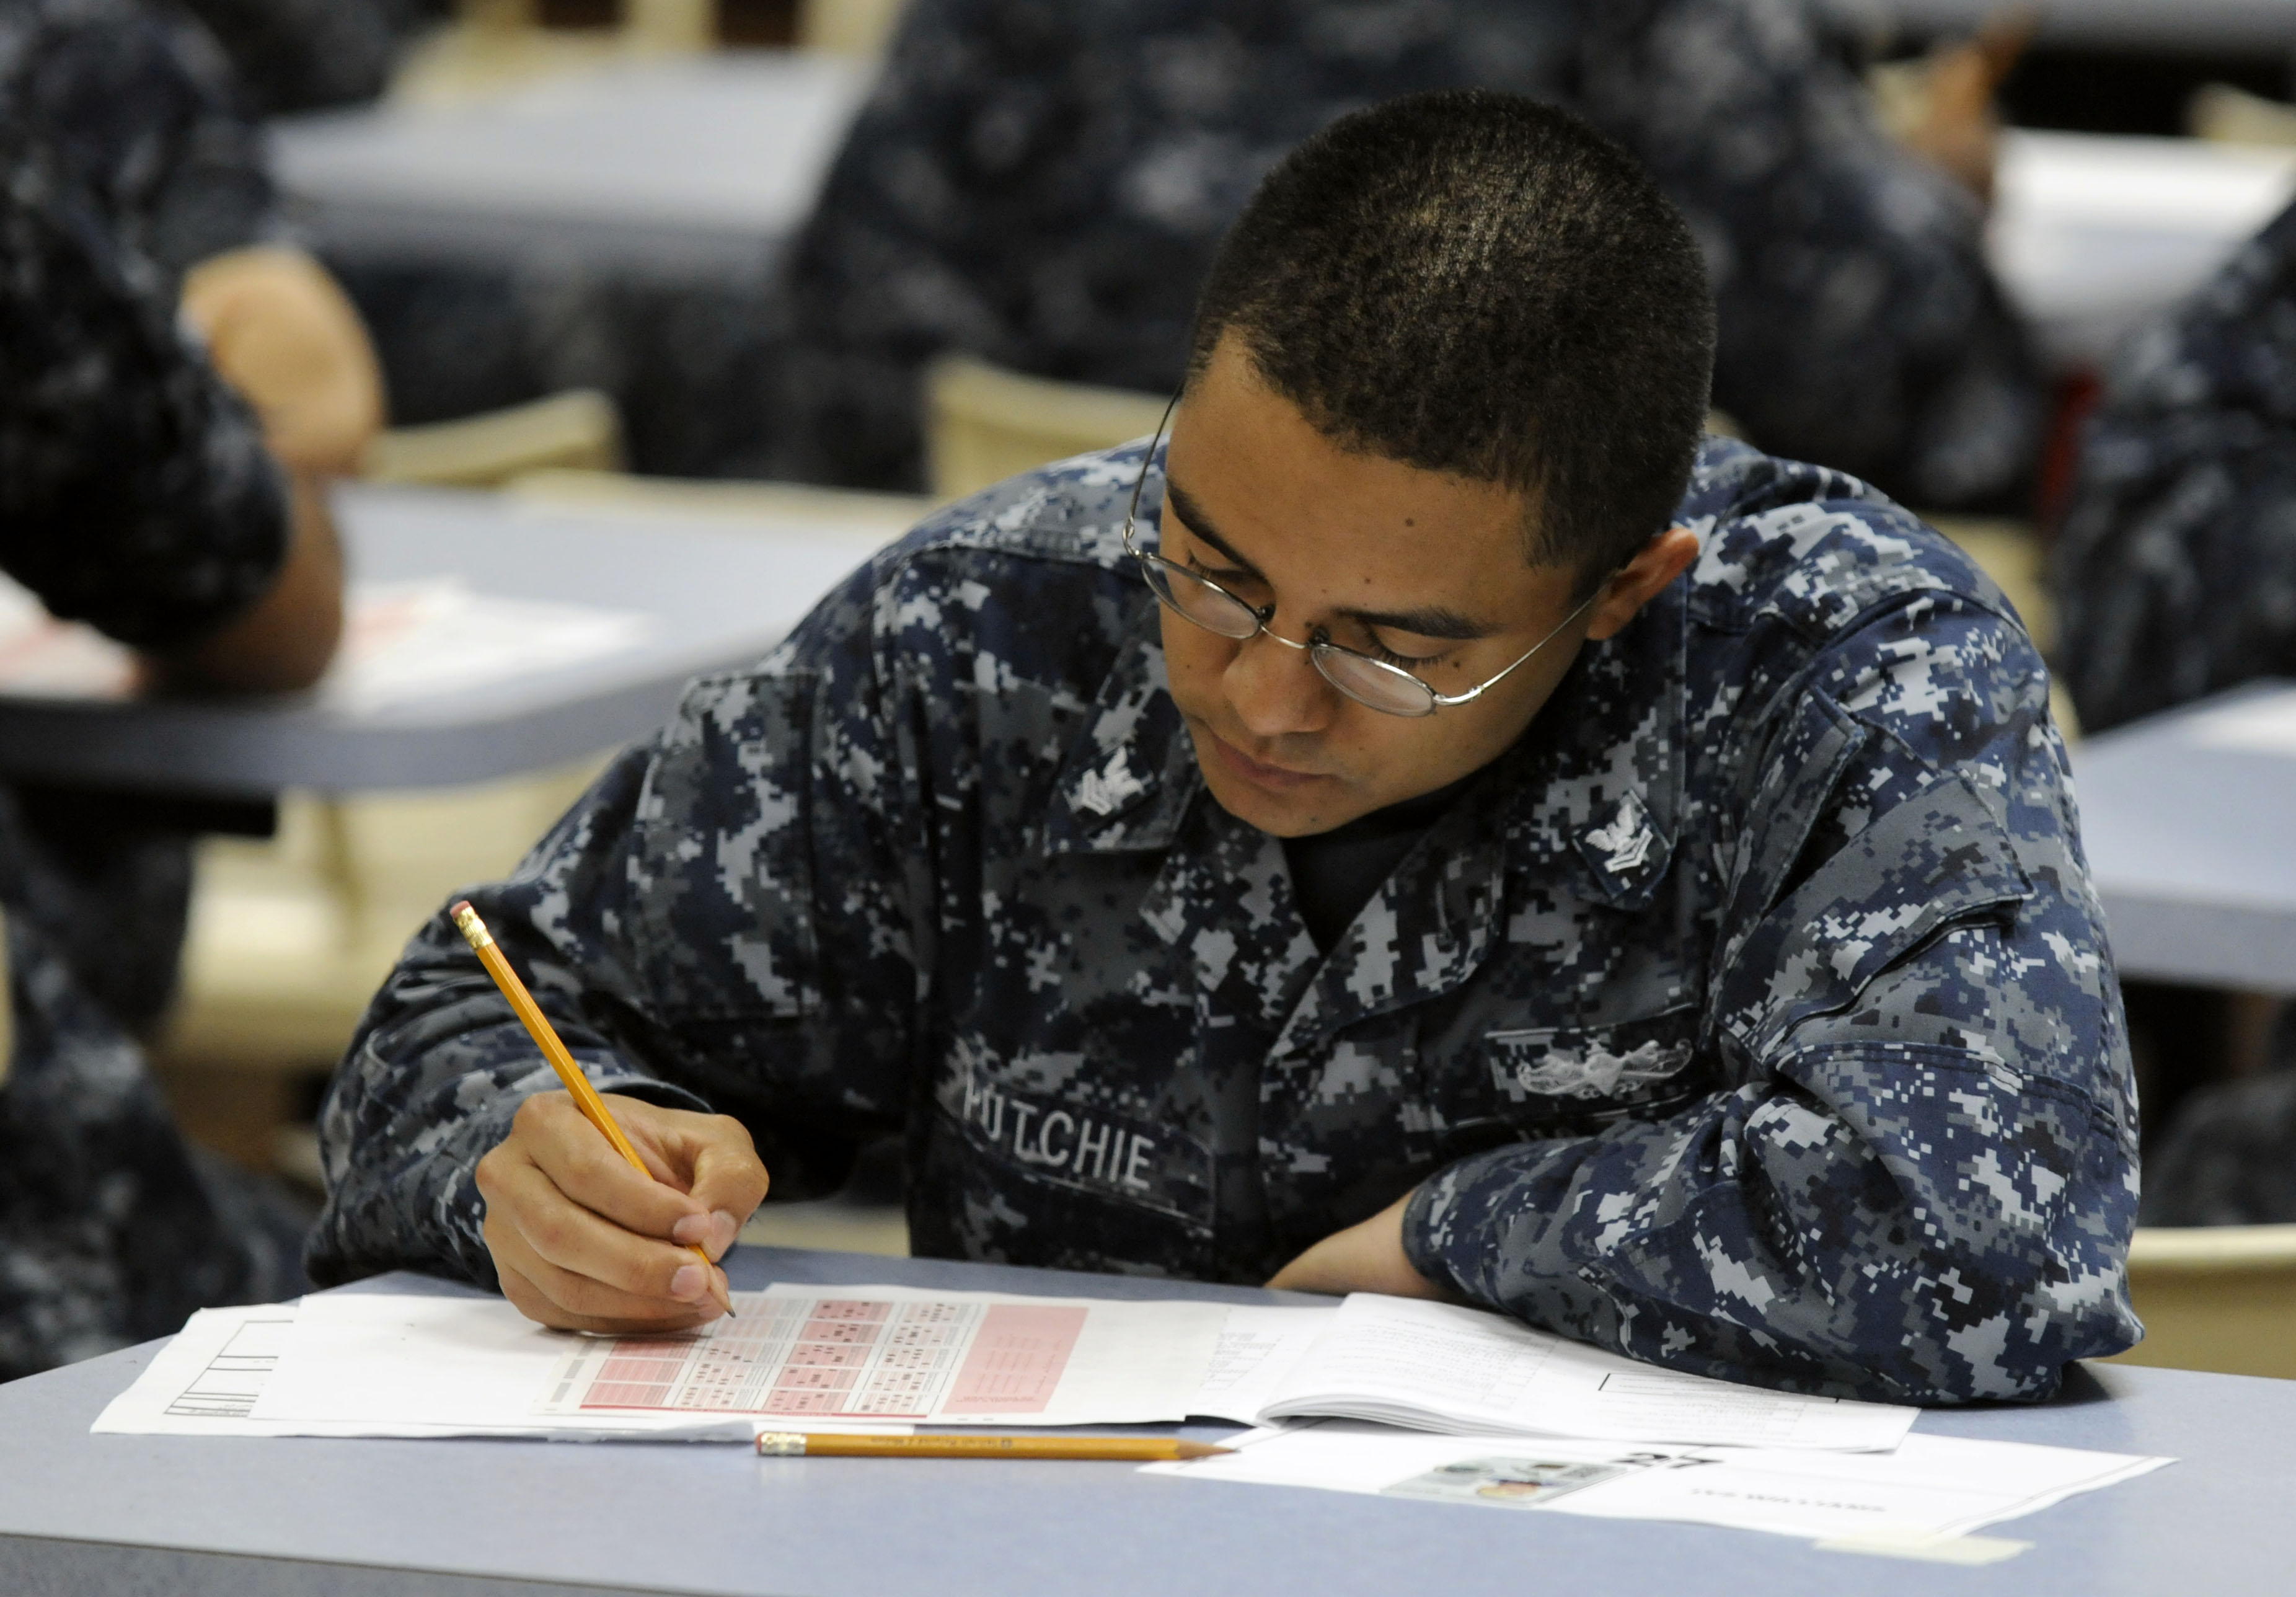 File:US Navy 110901-N-XG305-050 Logistics Specialist 2nd Class ...